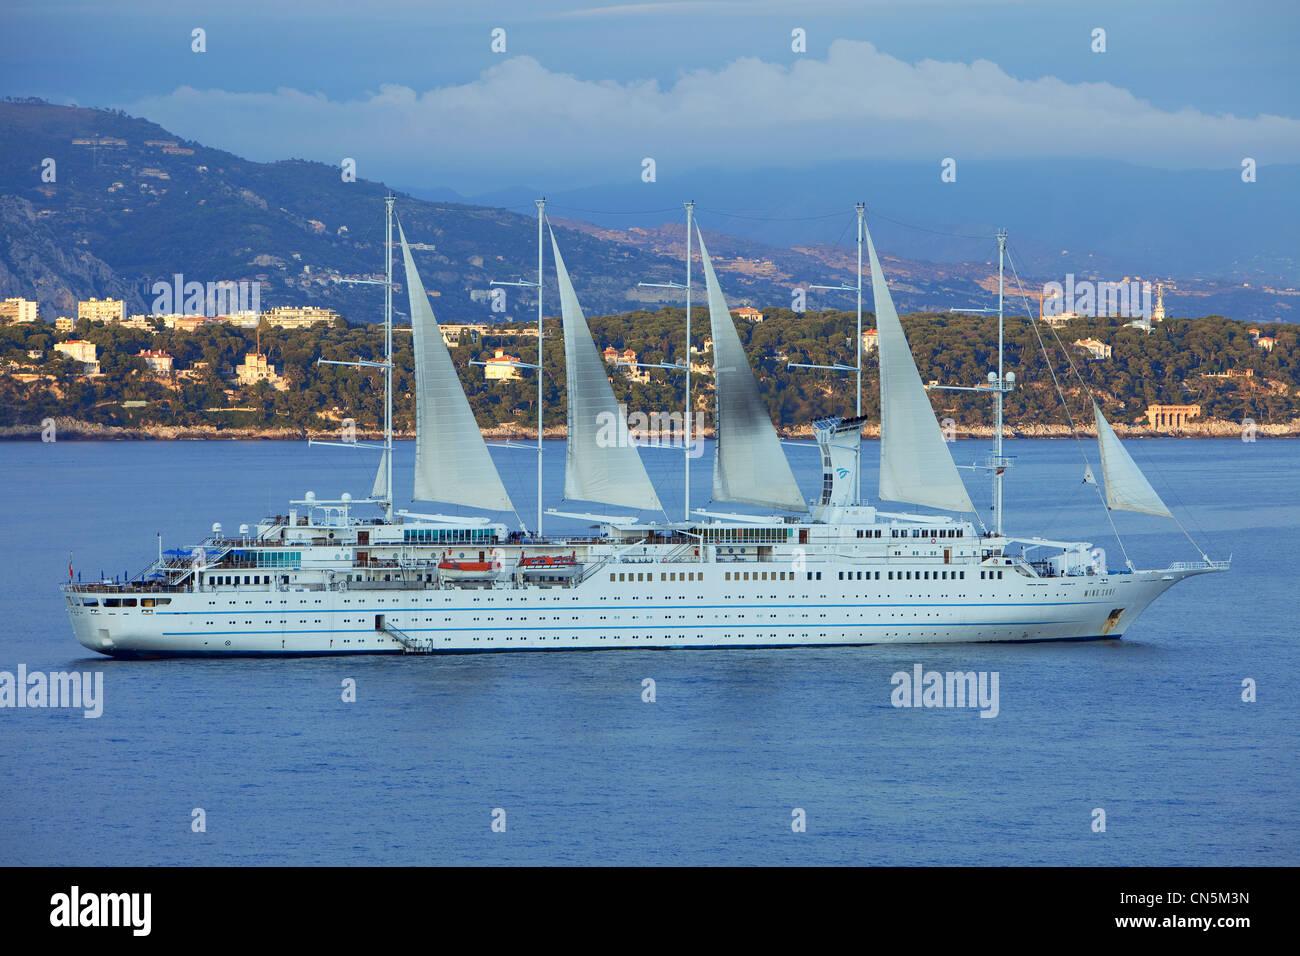 Principality of Monaco, Monaco, Club Med cruise ship to the bottom Cape Martin - Stock Image